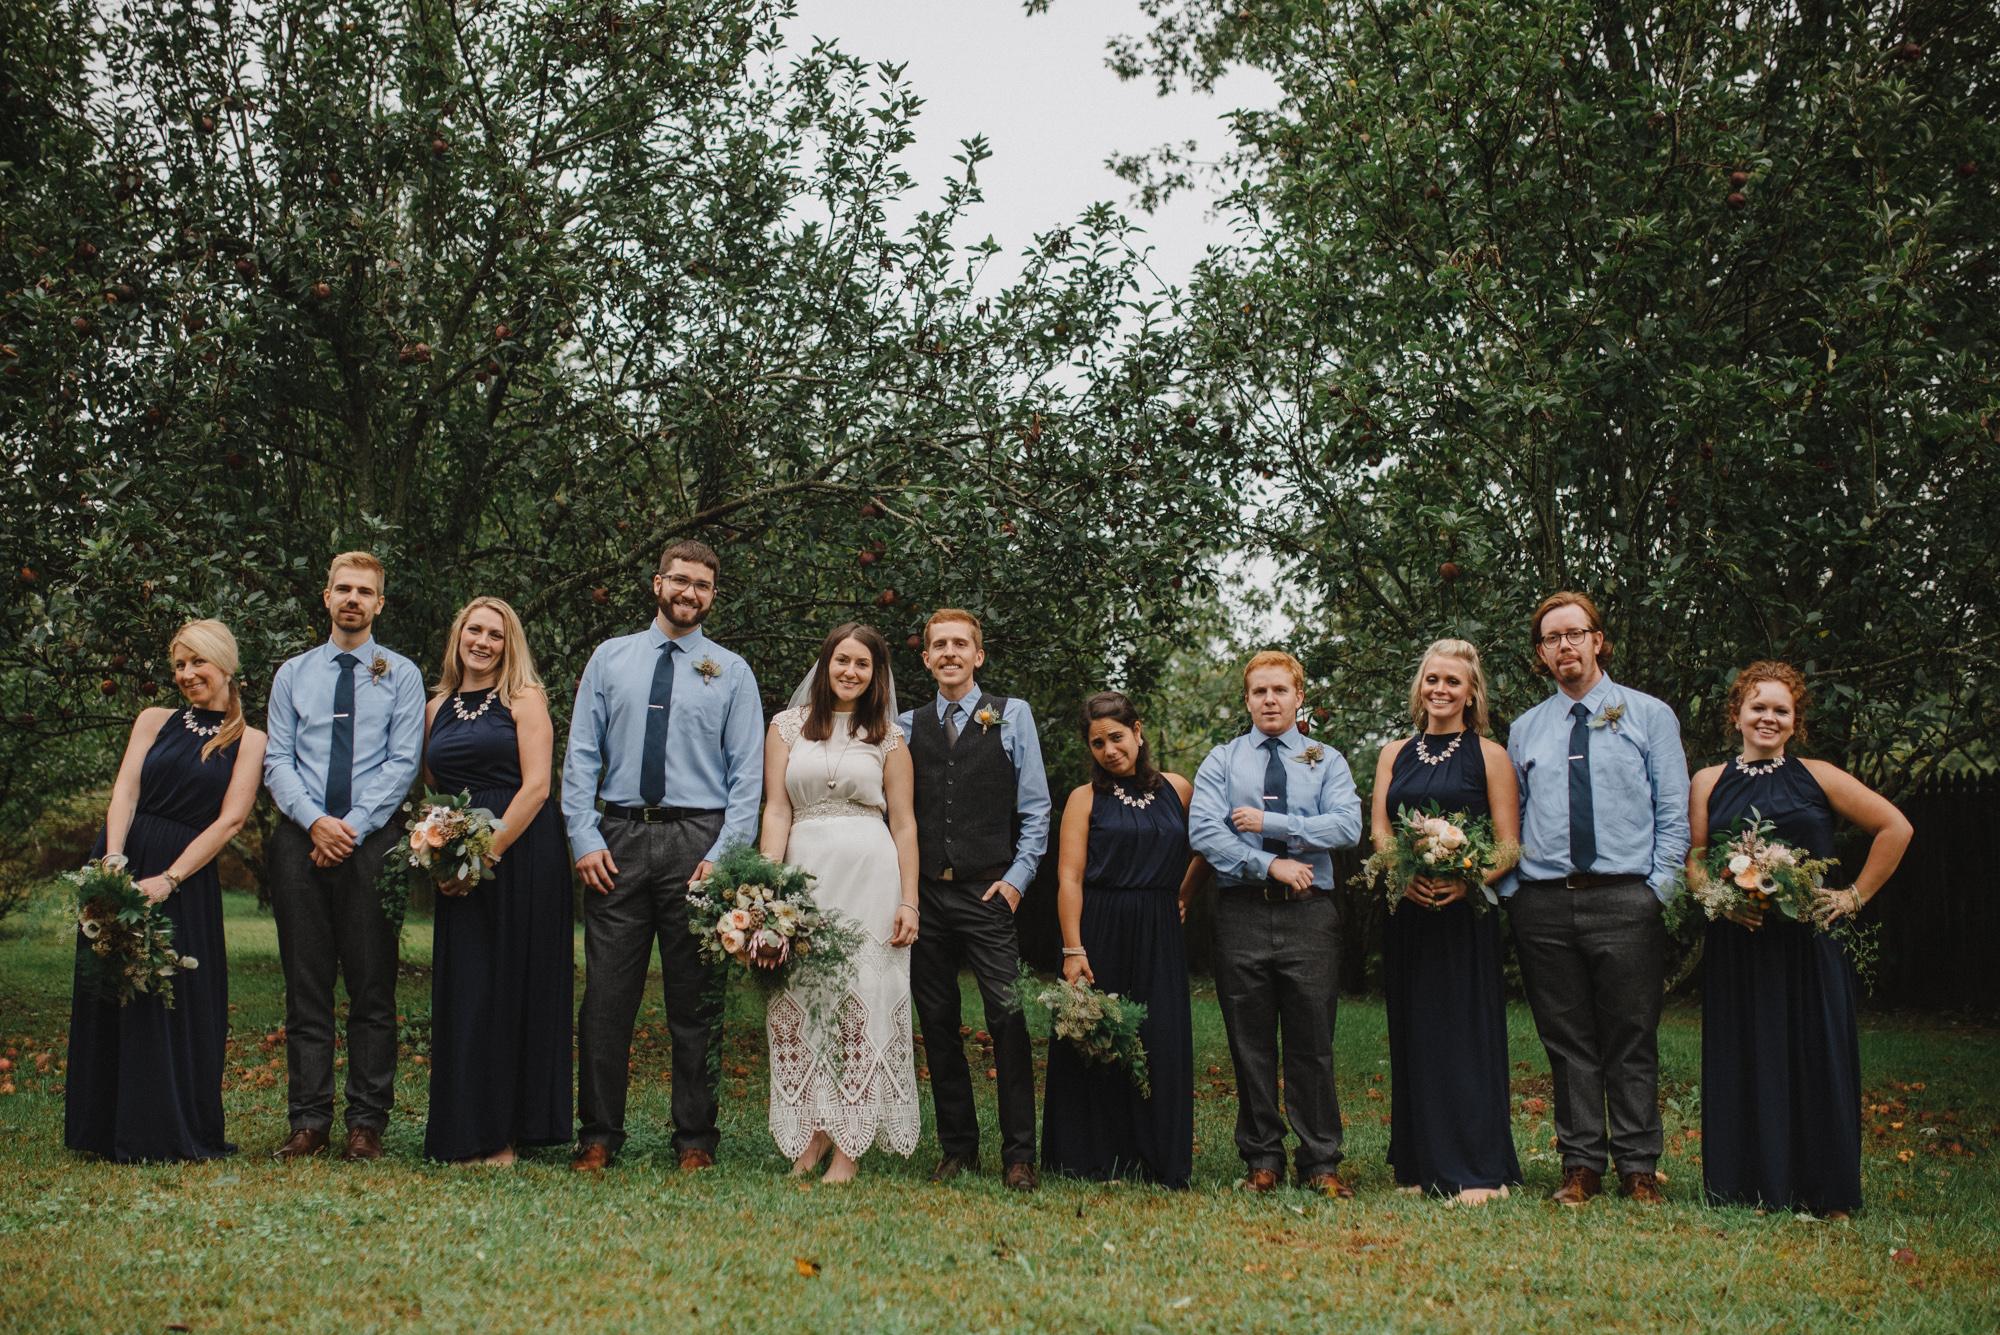 Delaware_Wedding_Photography_DSC_3585.jpg